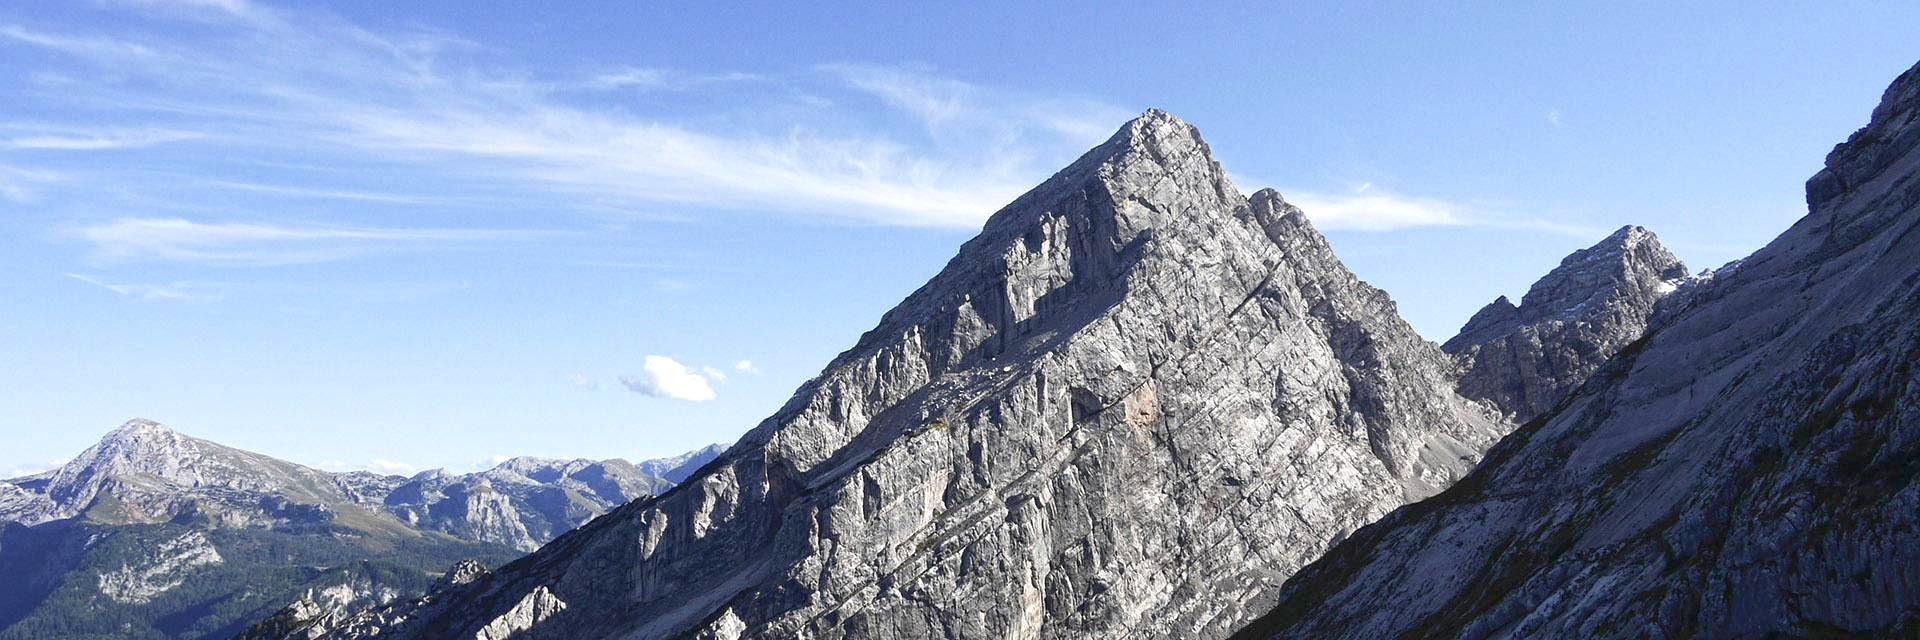 Einzigartige Bergwelt